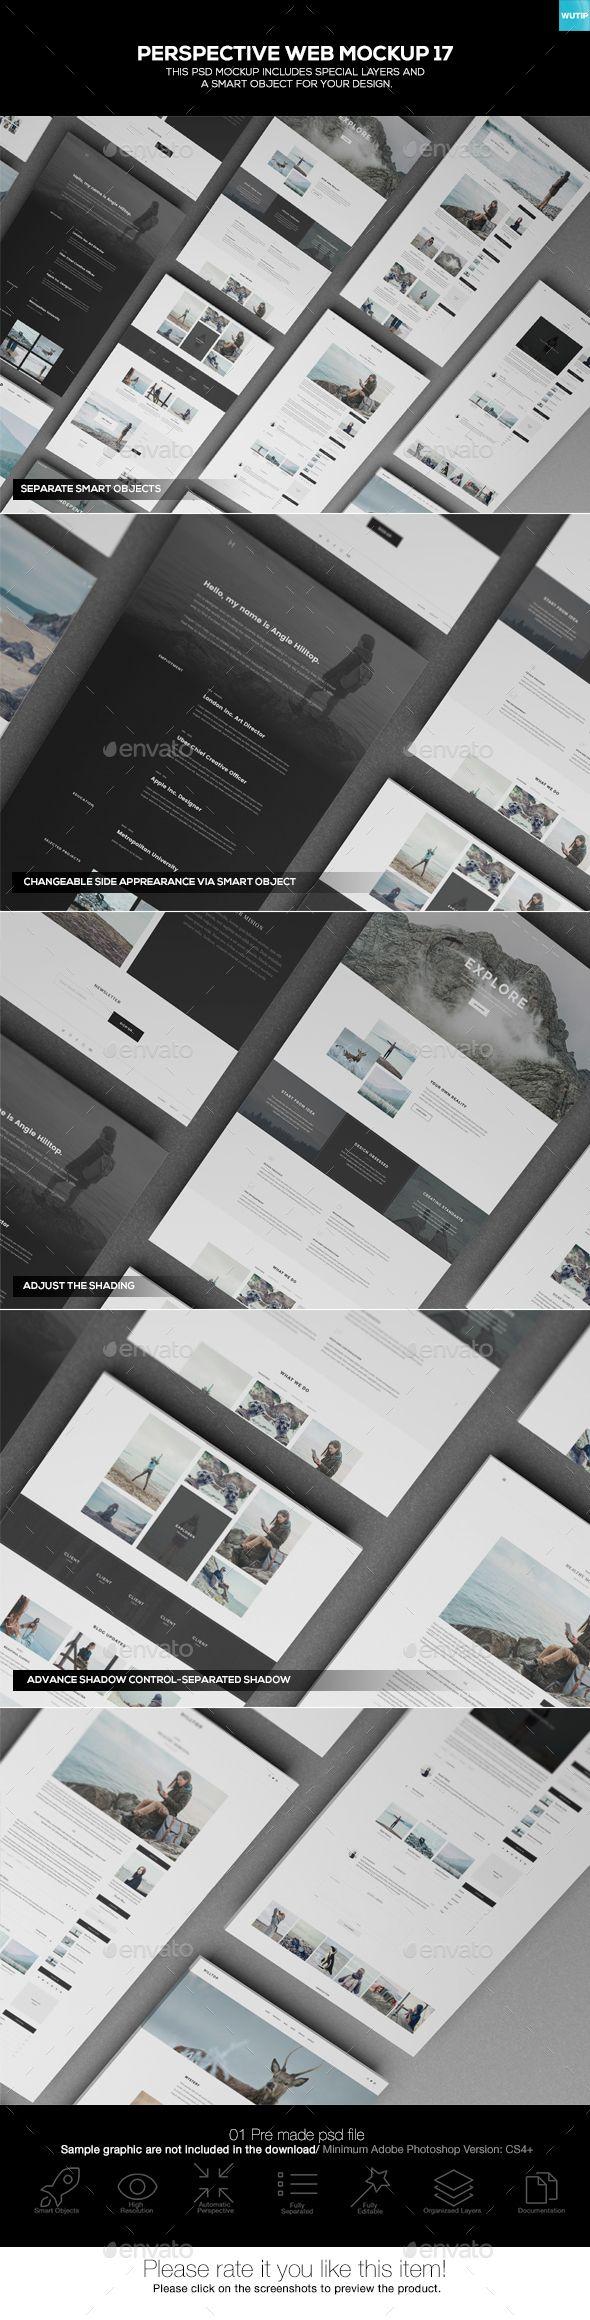 Perspective Web Mockup